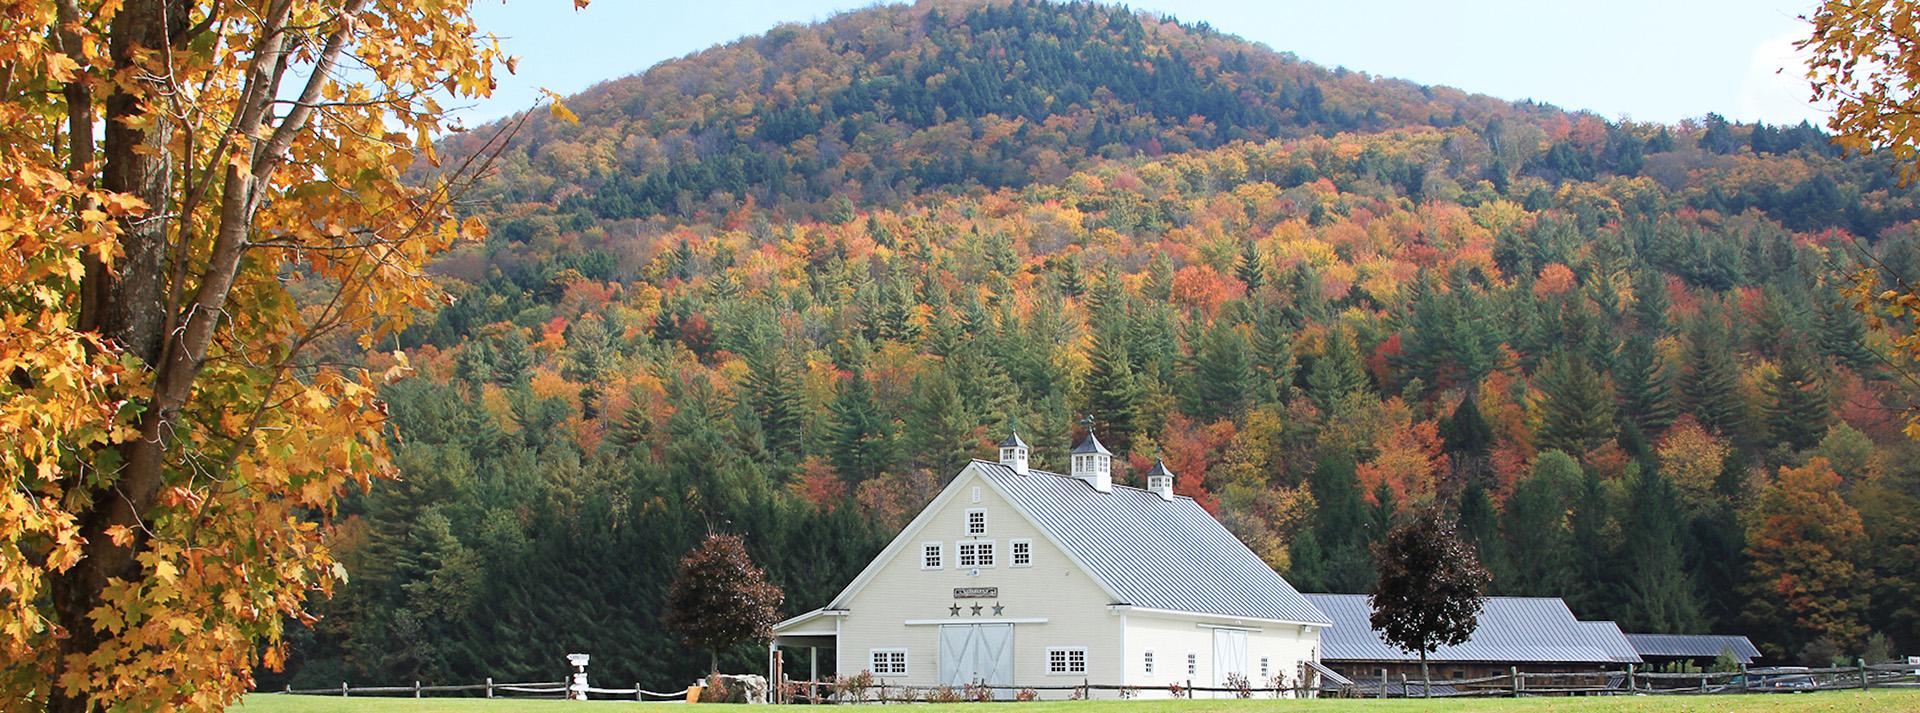 Vermont Wedding Venues.Riverside Farm Vermont Weddings